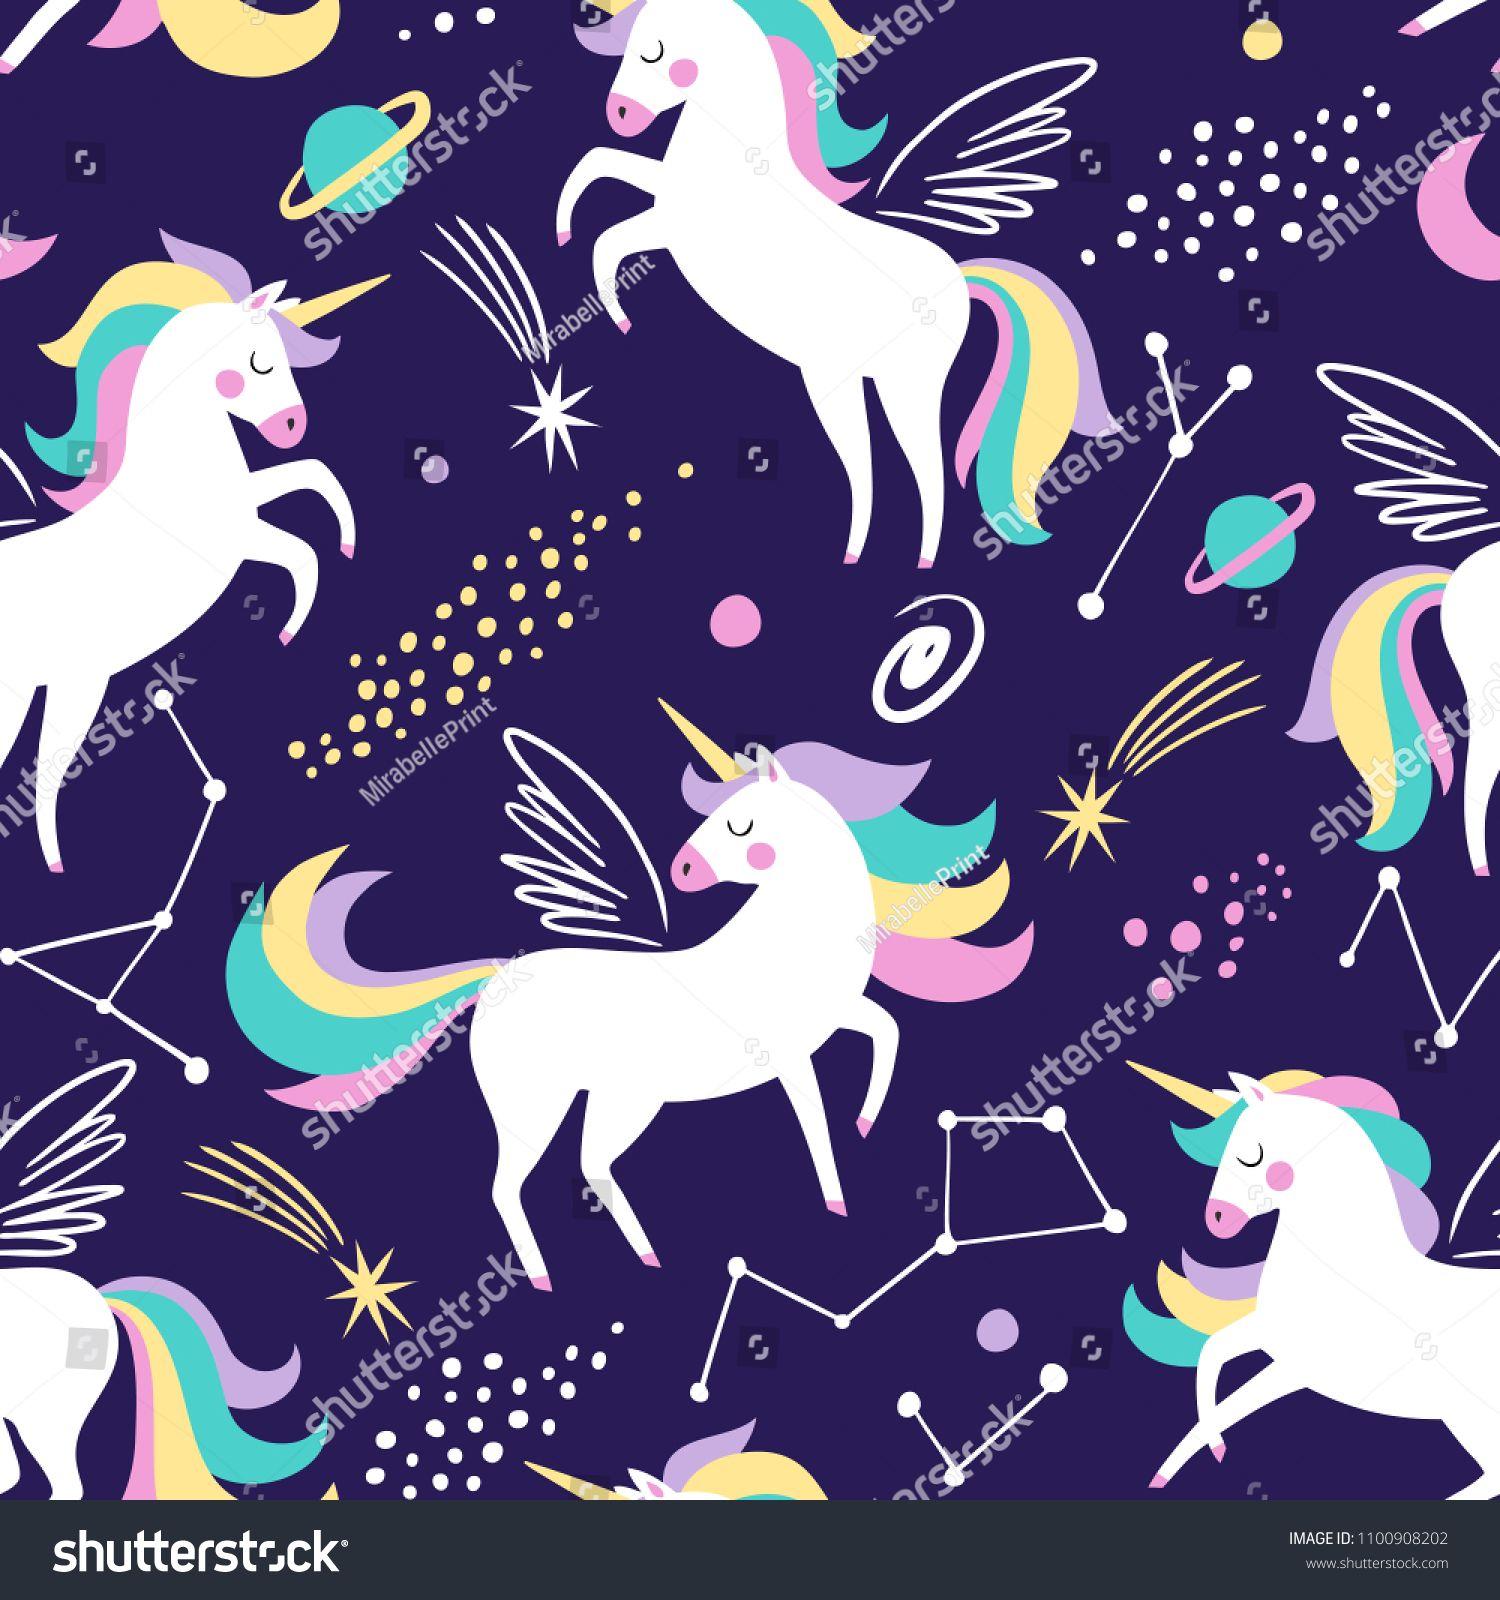 Wallpaper My girly wallpaper Pinterest Unicorns and